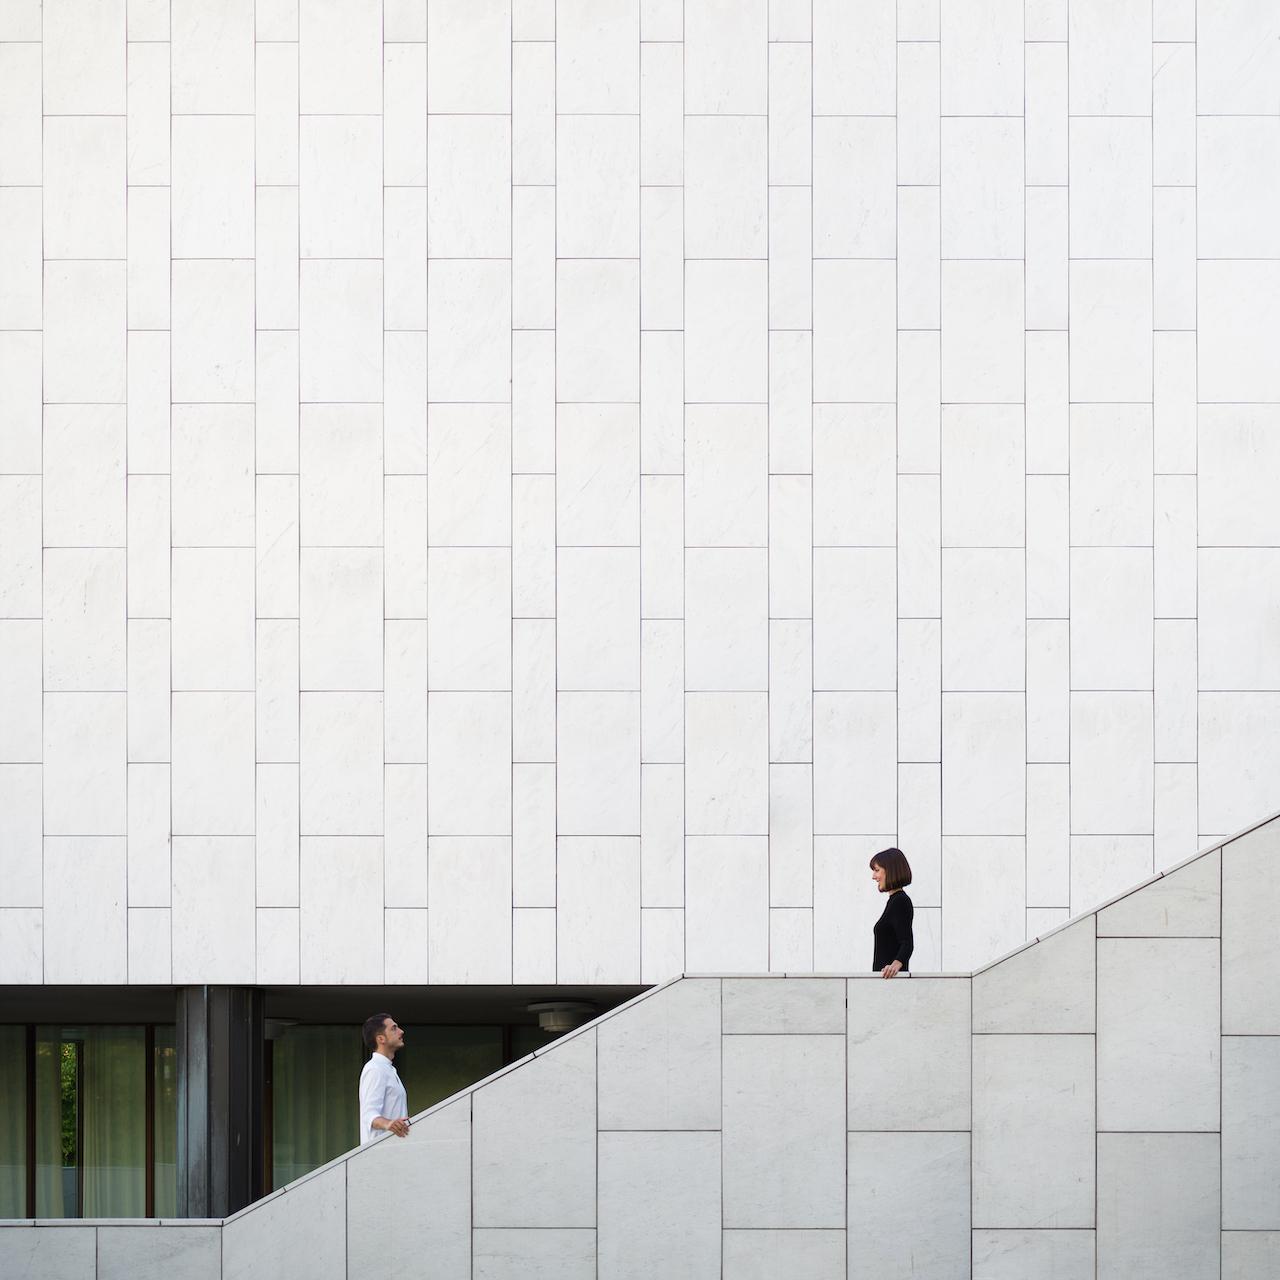 Anna Devís Daniel Rueda drcuerda anniset creative photography perspective yin yang Helsinki Finland Alvar Aalto Finland Hall black and white